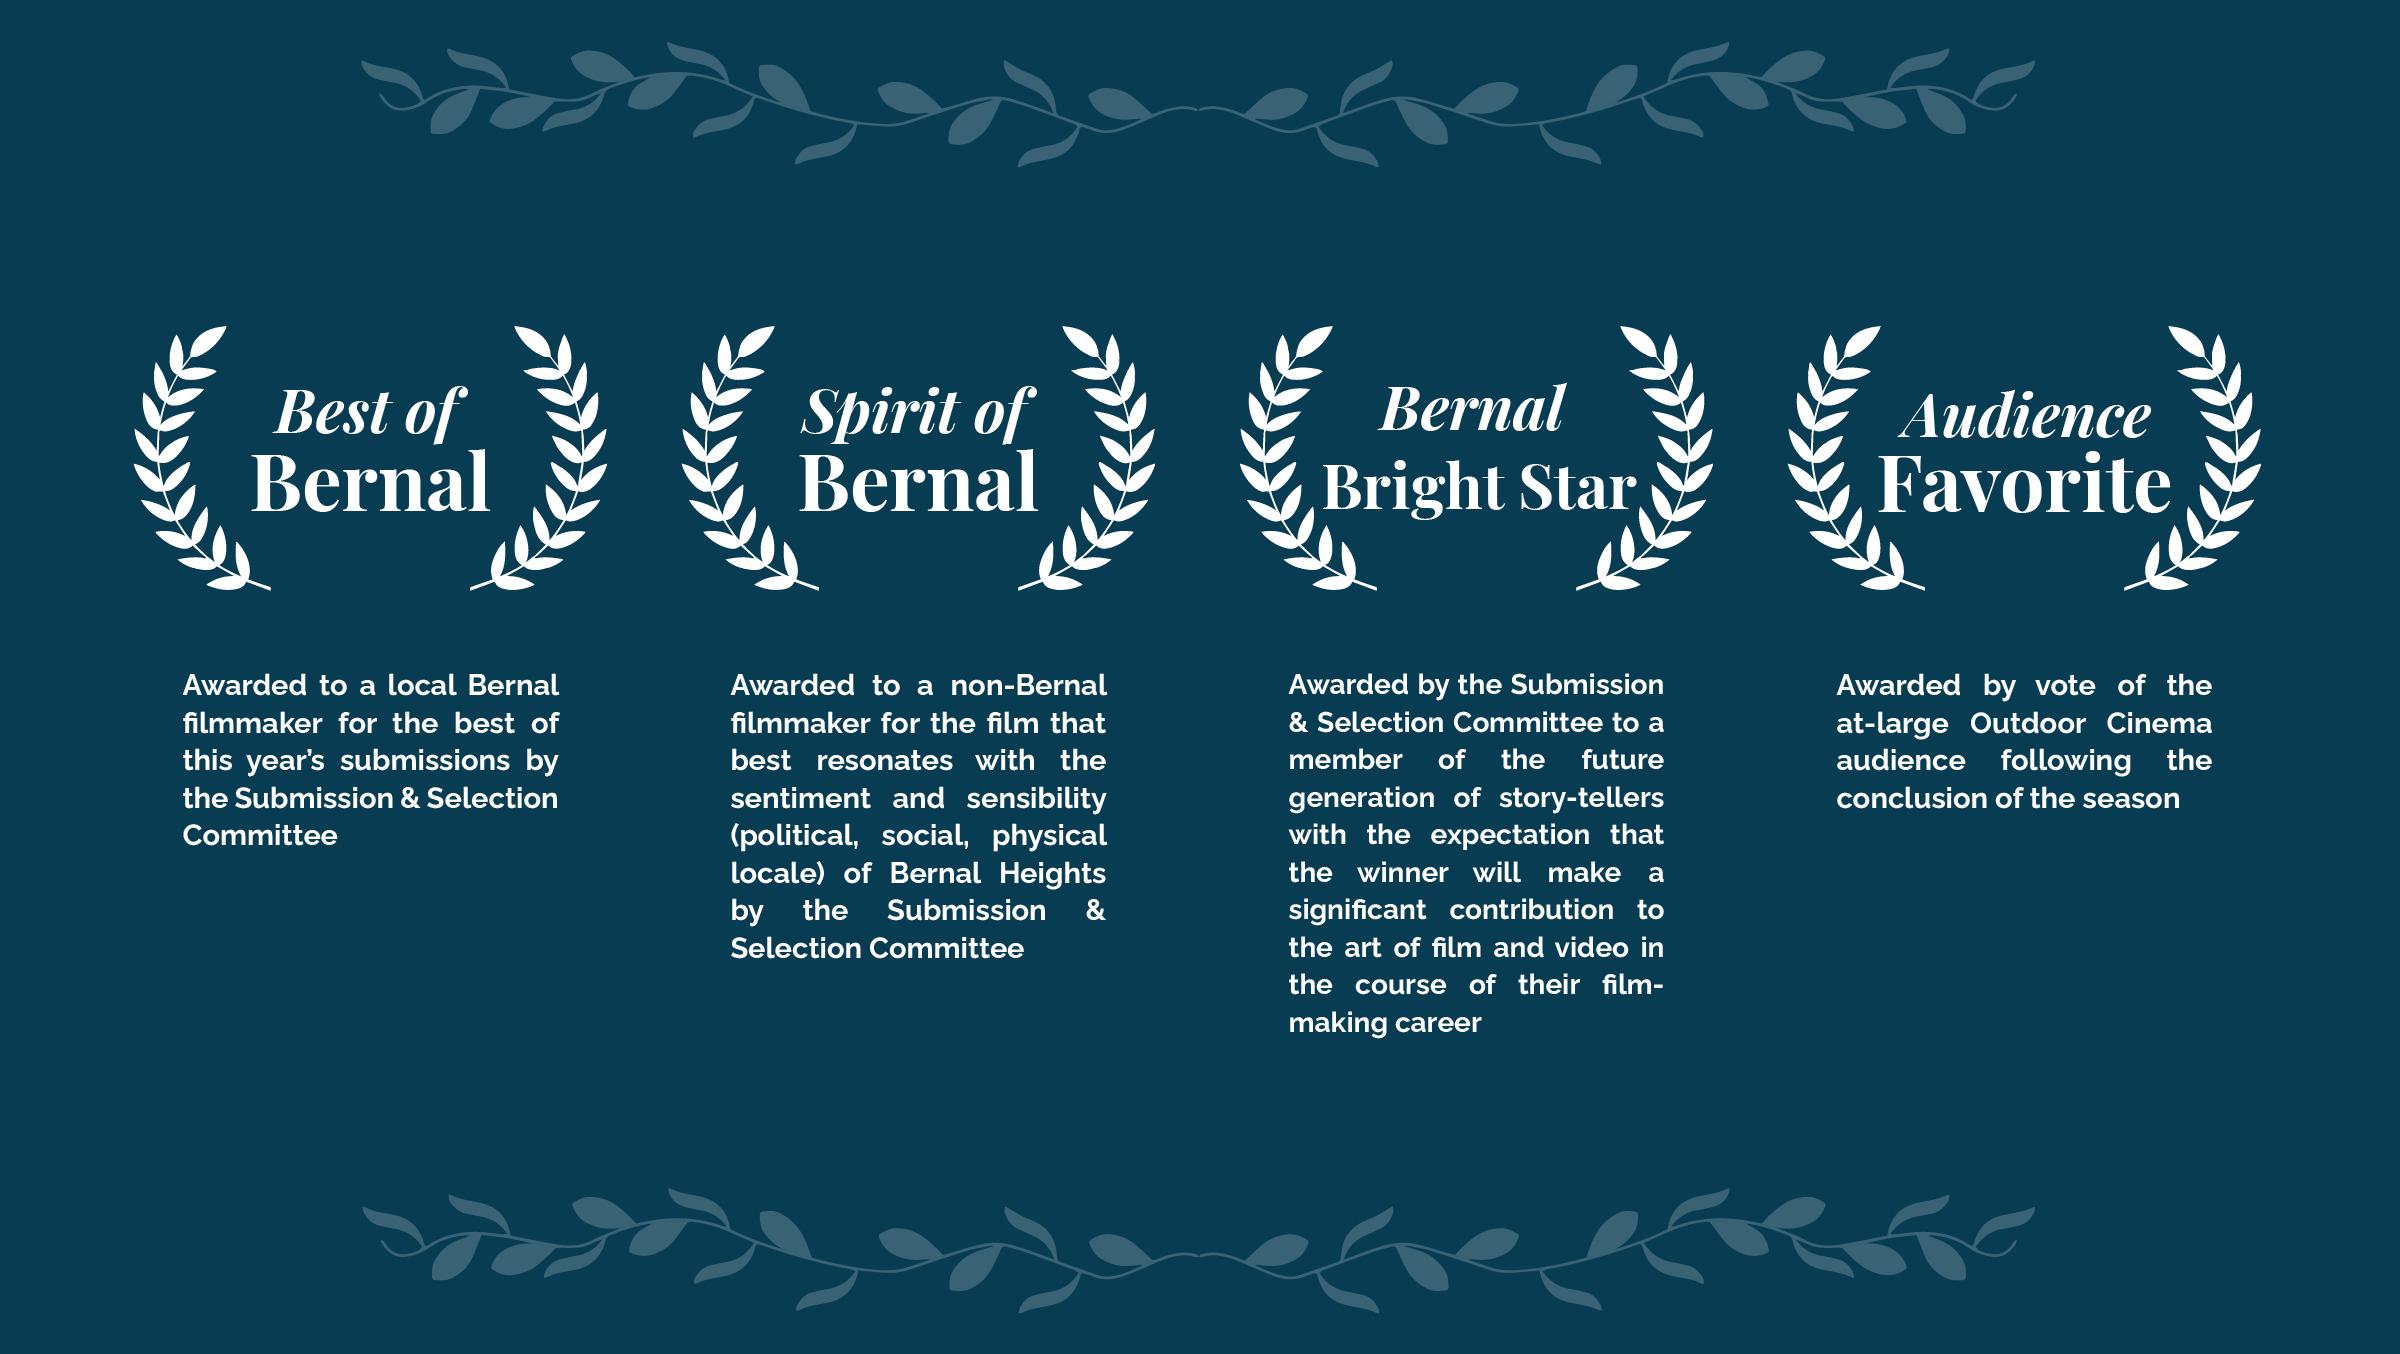 Best of Bernal Laurels-01